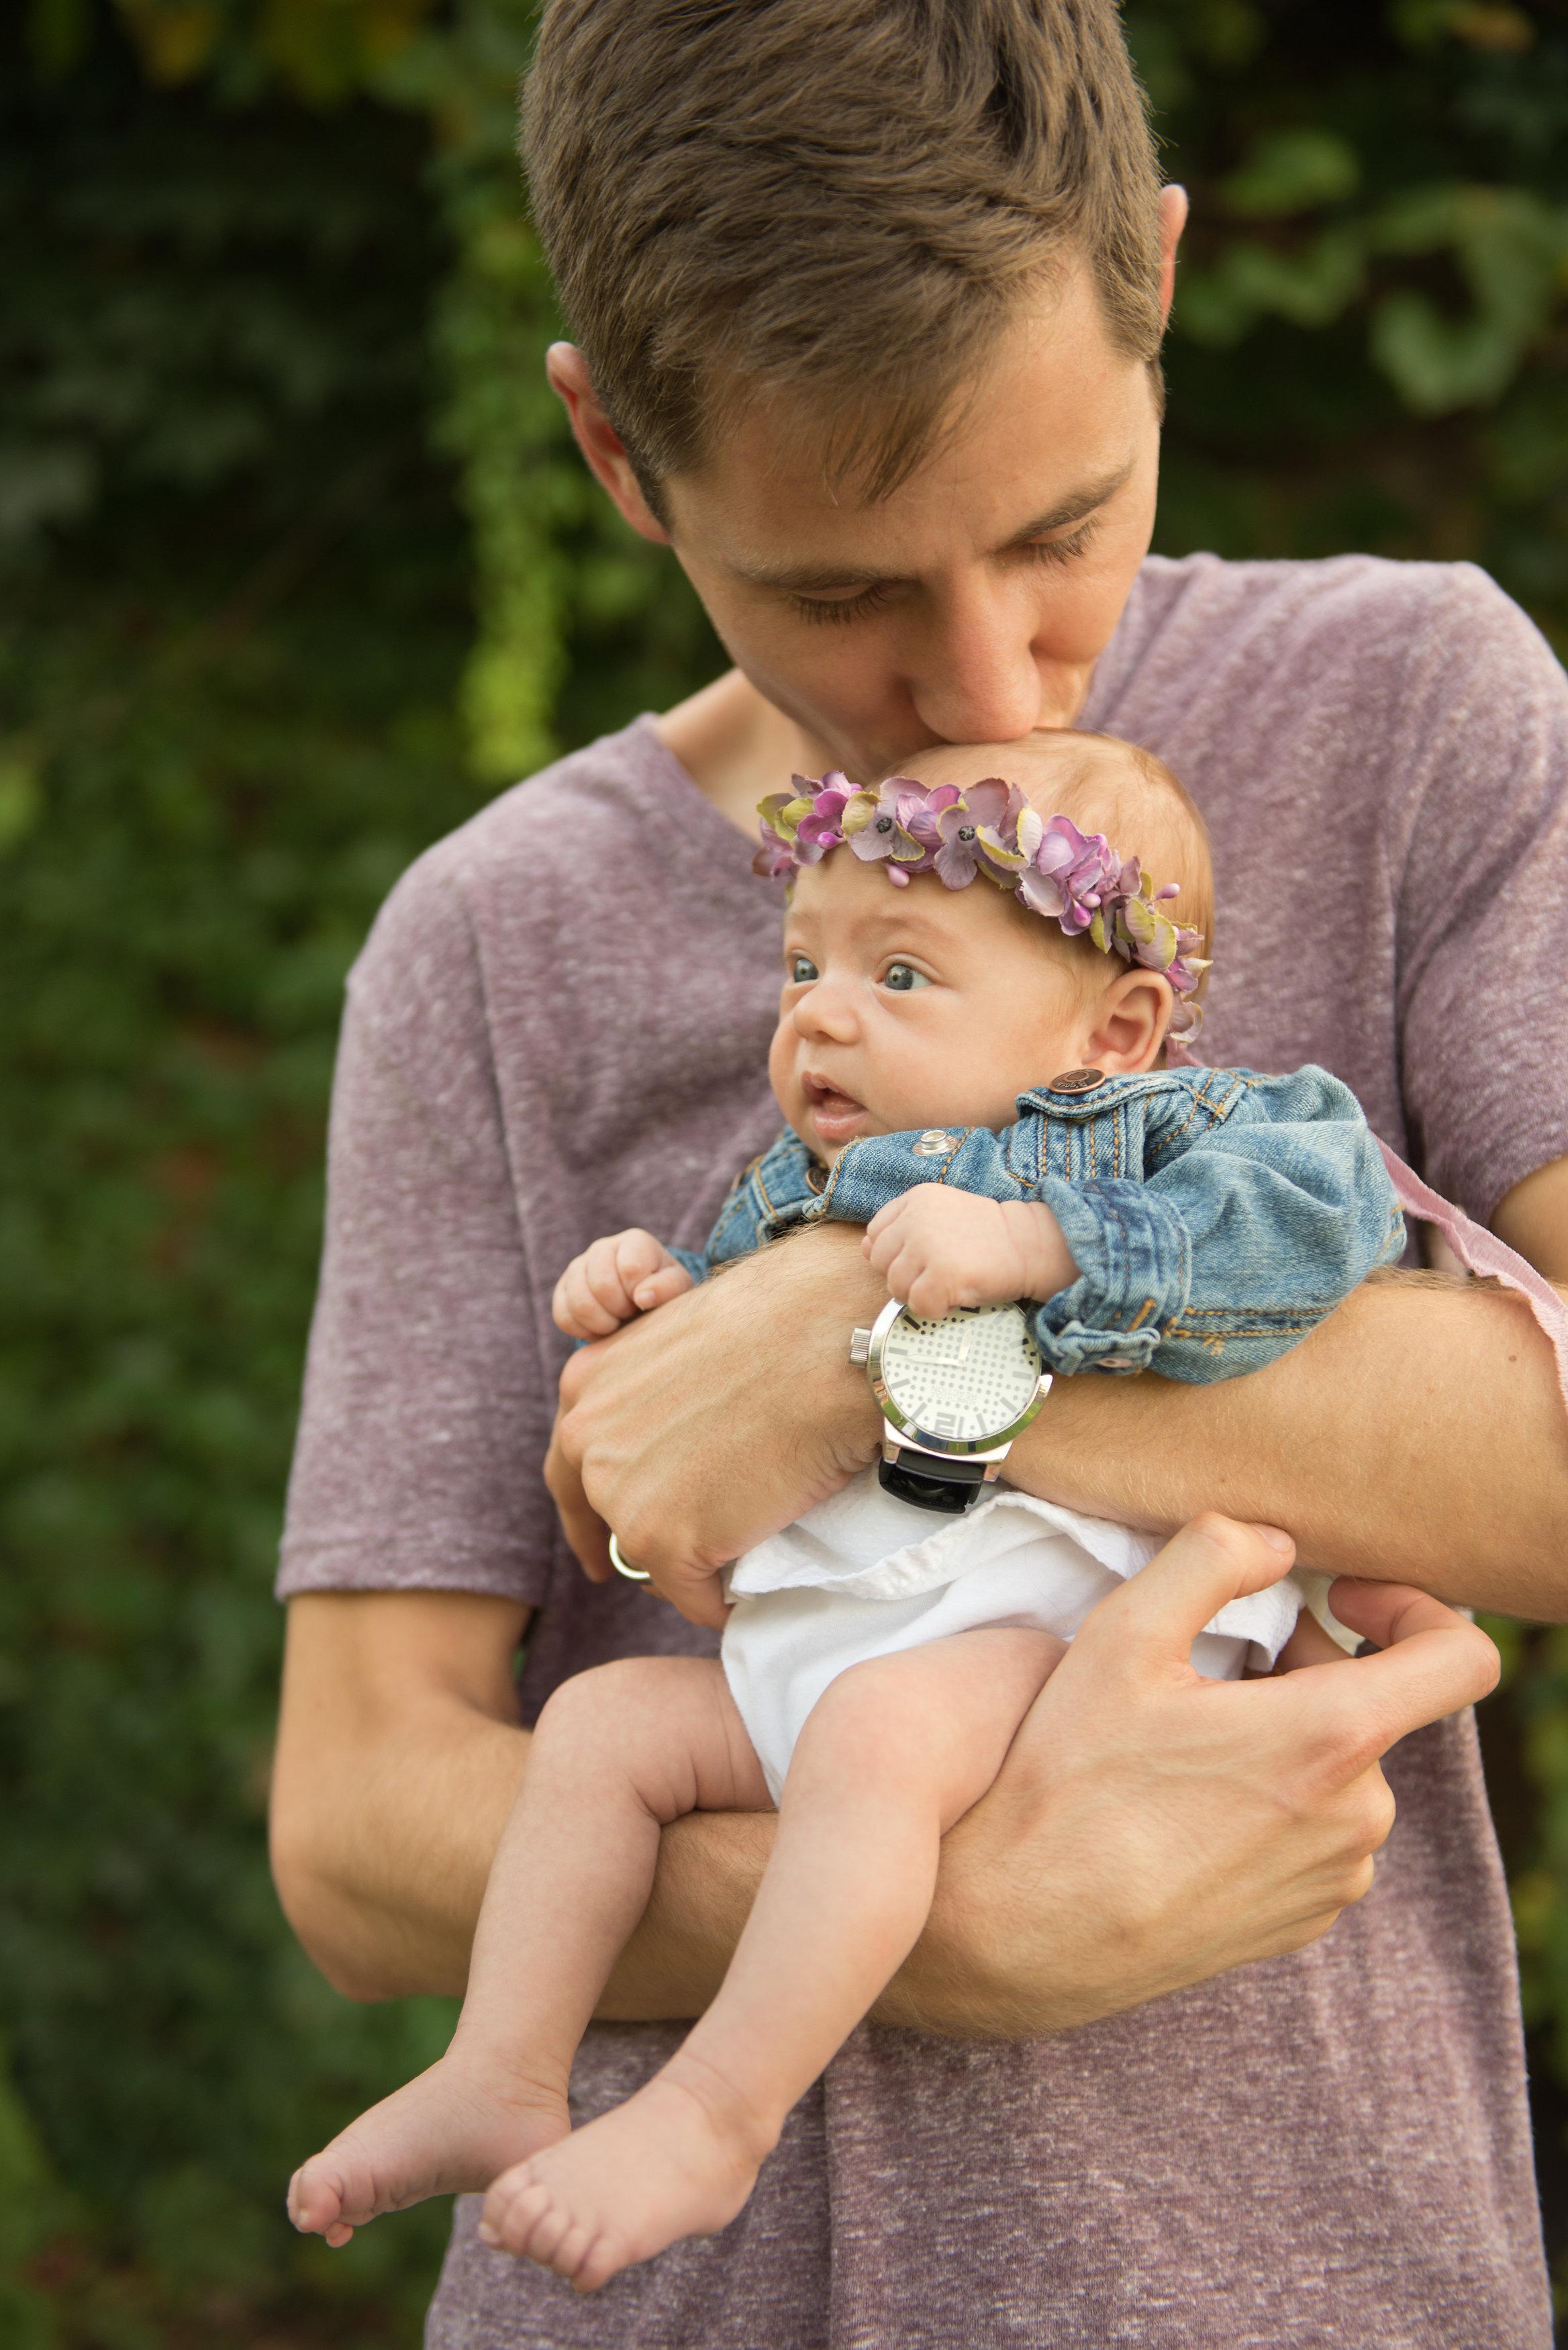 Orlando-father-daughter-purple.jpg